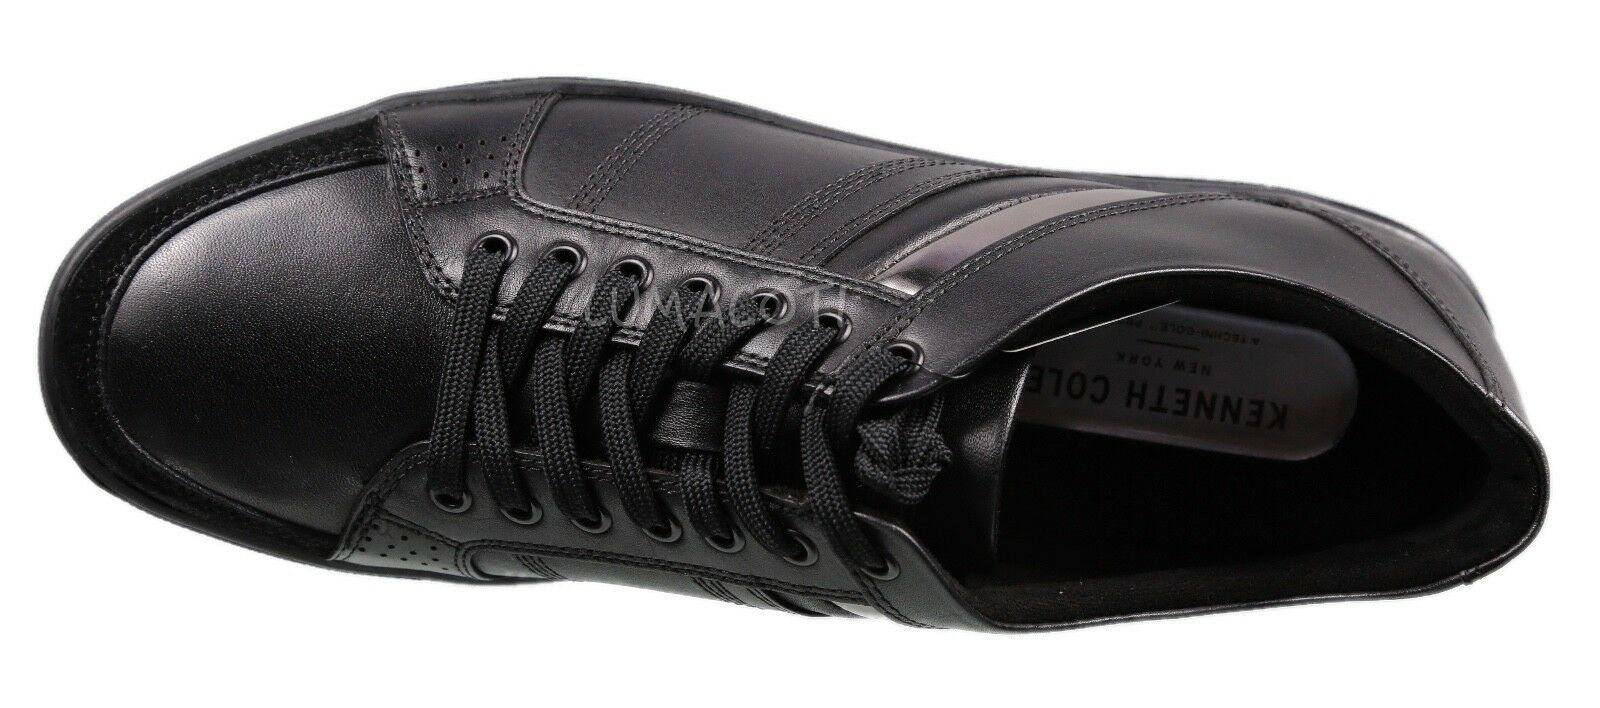 Mens Kenneth Cole Black Initial Sneaker [KMF8024LE 001]